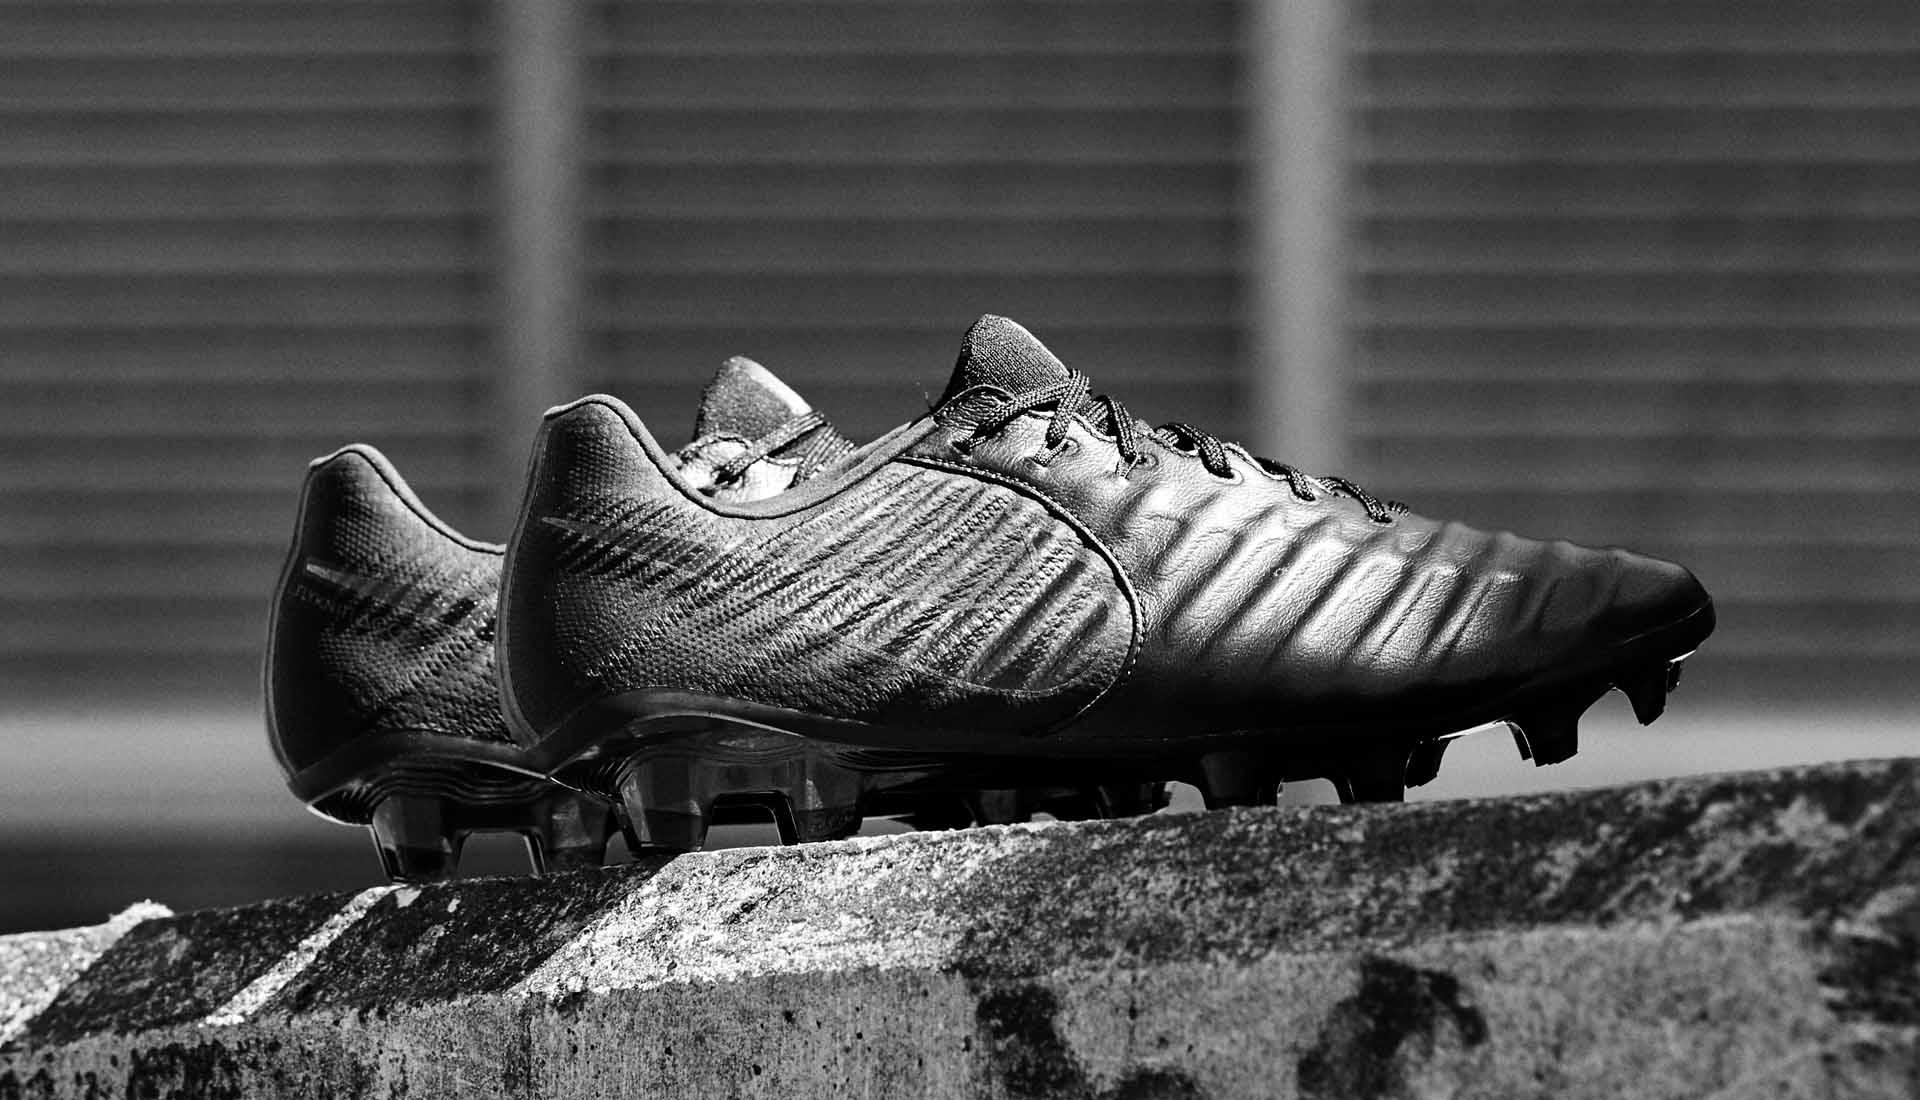 c56deee8f Nike Launch The Tiempo 7